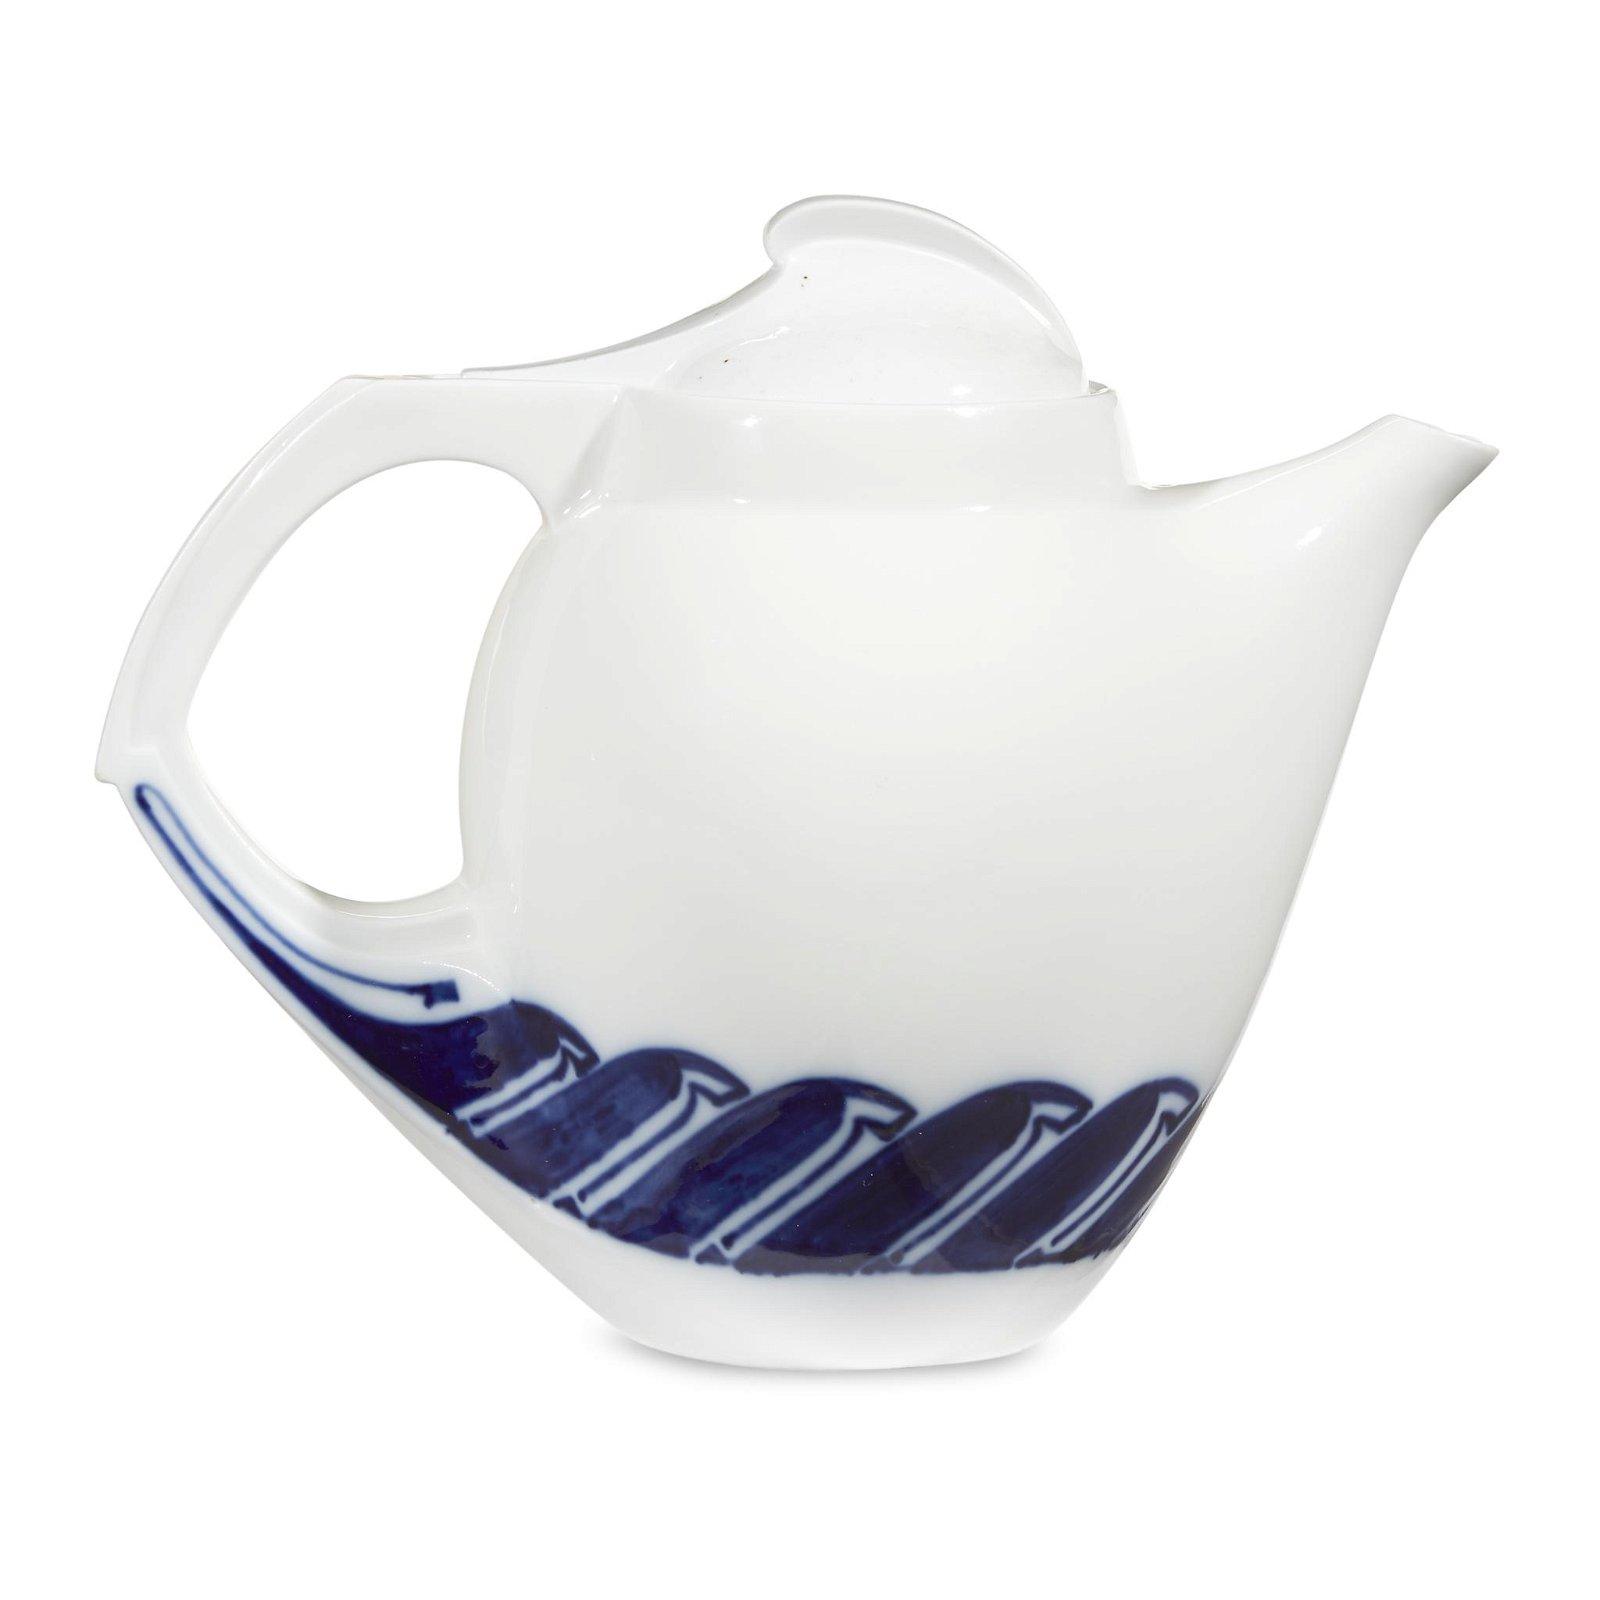 Henry van de Velde (Dutch, 1863-1957), A Coffee Pot,